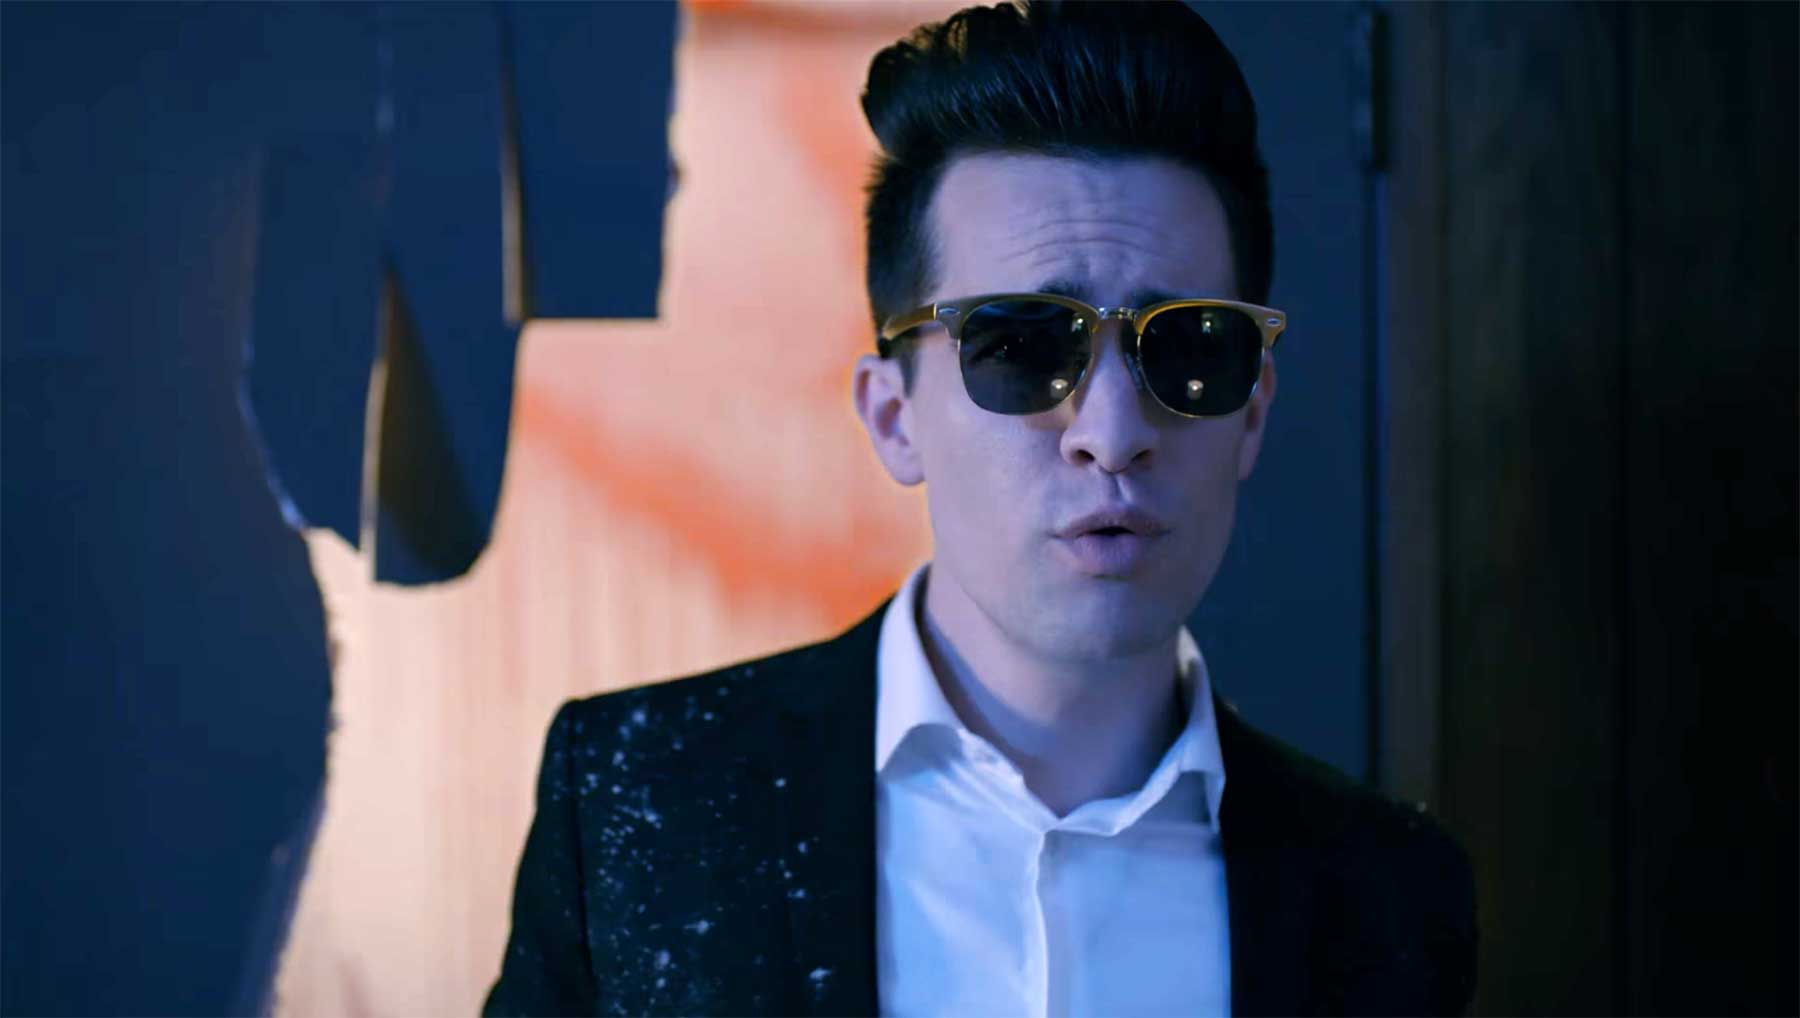 Panic! At The Disco - Say Amen (Saturday Night) panic-at-the-disco-say-amen-saturday-night